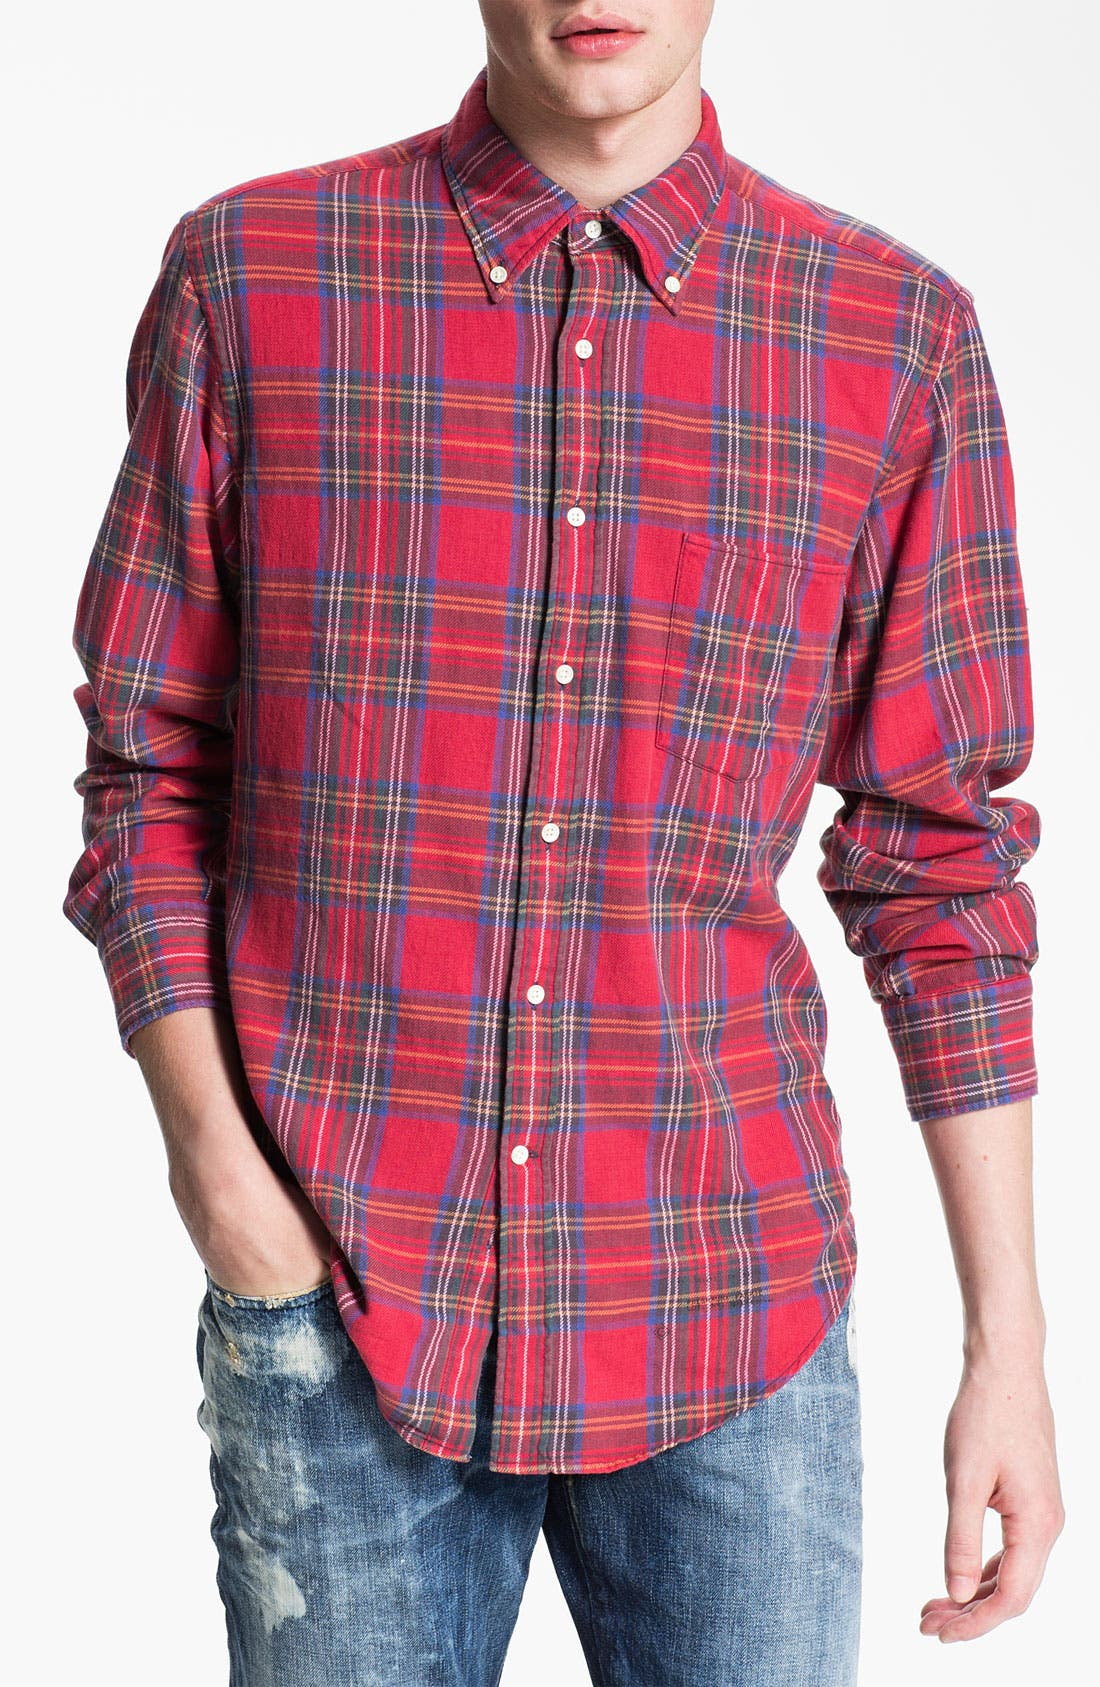 Main Image - Gant Rugger 'Tinkering' Twill Plaid Shirt